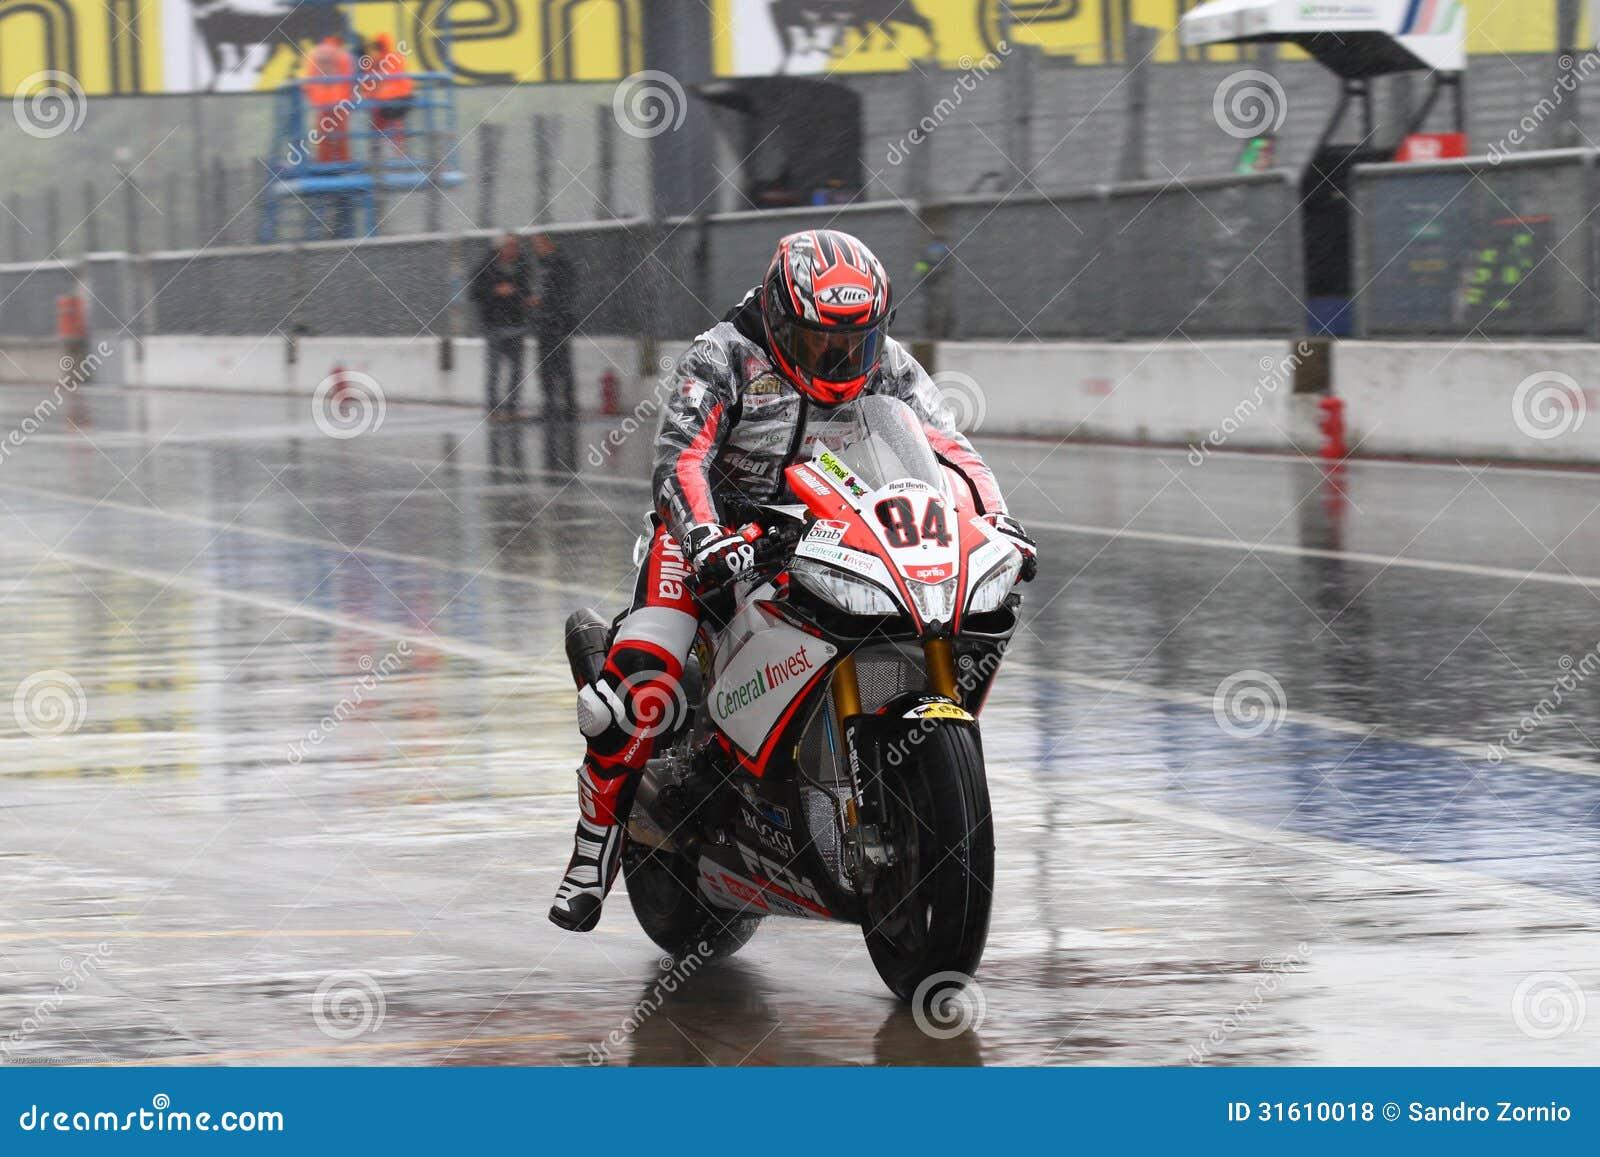 Michel Fabrizio #84 on Aprilia RSV4 1000 Factory Red Devils Roma Superbike WSBK